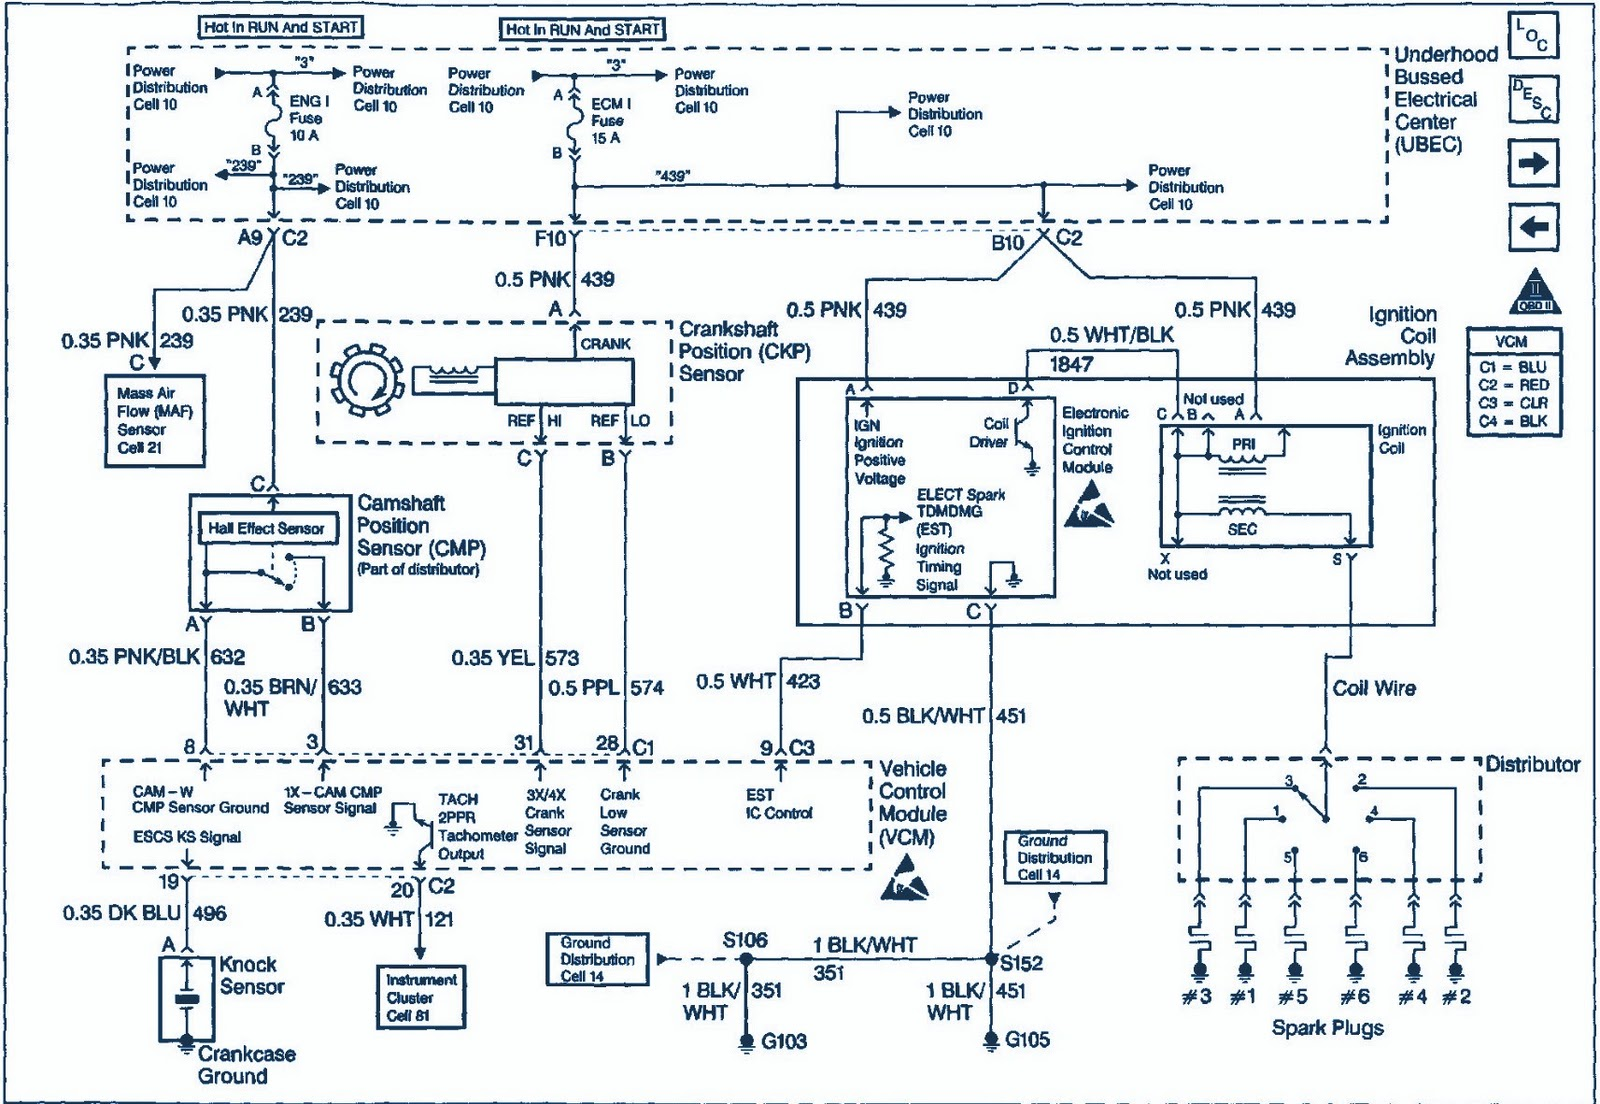 [SCHEMATICS_4FD]  LL_9351] 1998 Cavalier Fuse Diagram Download Diagram | Wiring Diagram For 98 Astro Van |  | Retr Marki Anal Diog Bocep Mohammedshrine Librar Wiring 101